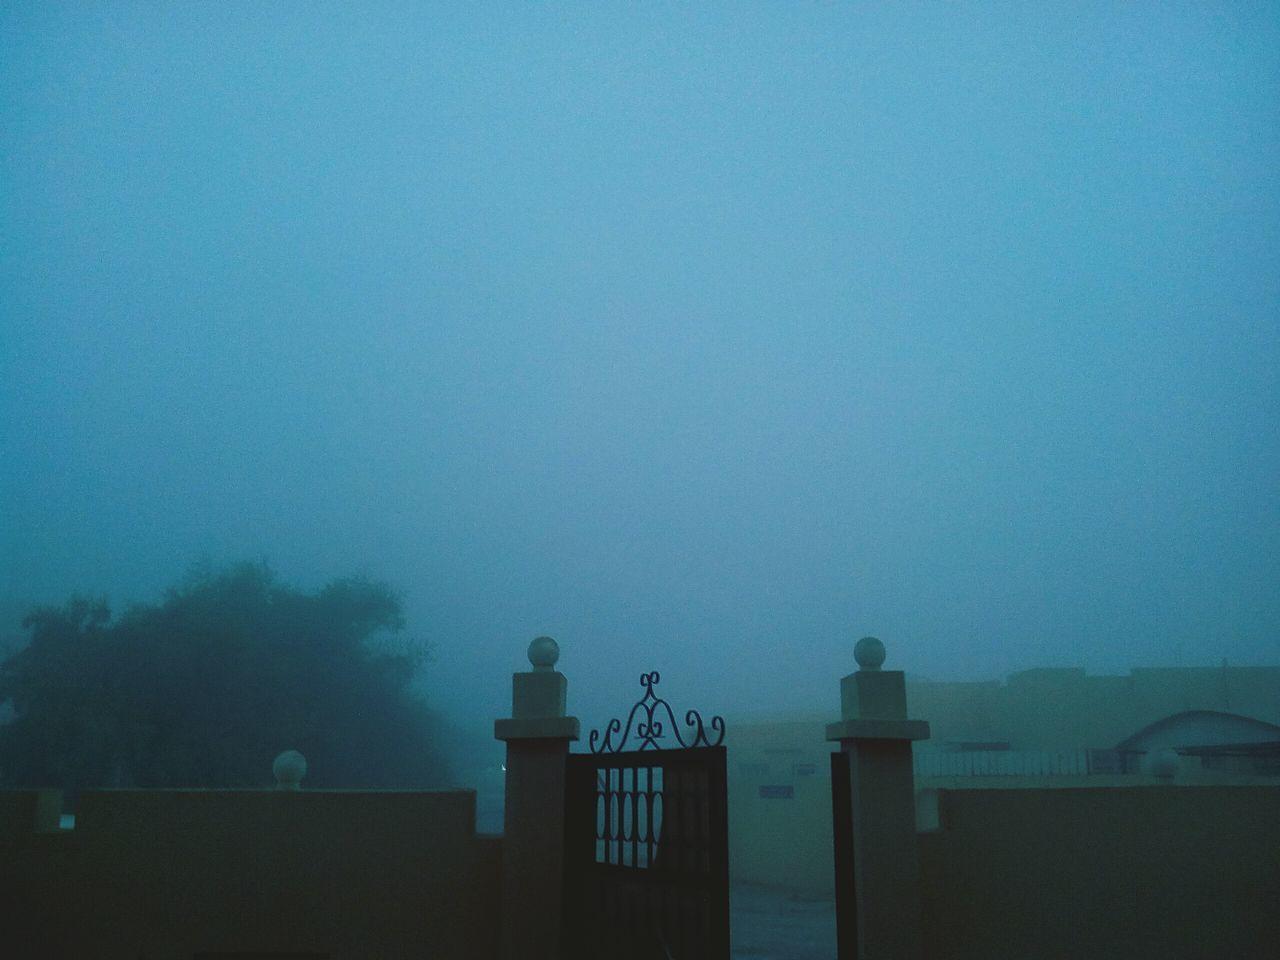 Gloomy Day Gloomy Weather Gloomy Sky Foggy Morning Fogporn Foggy